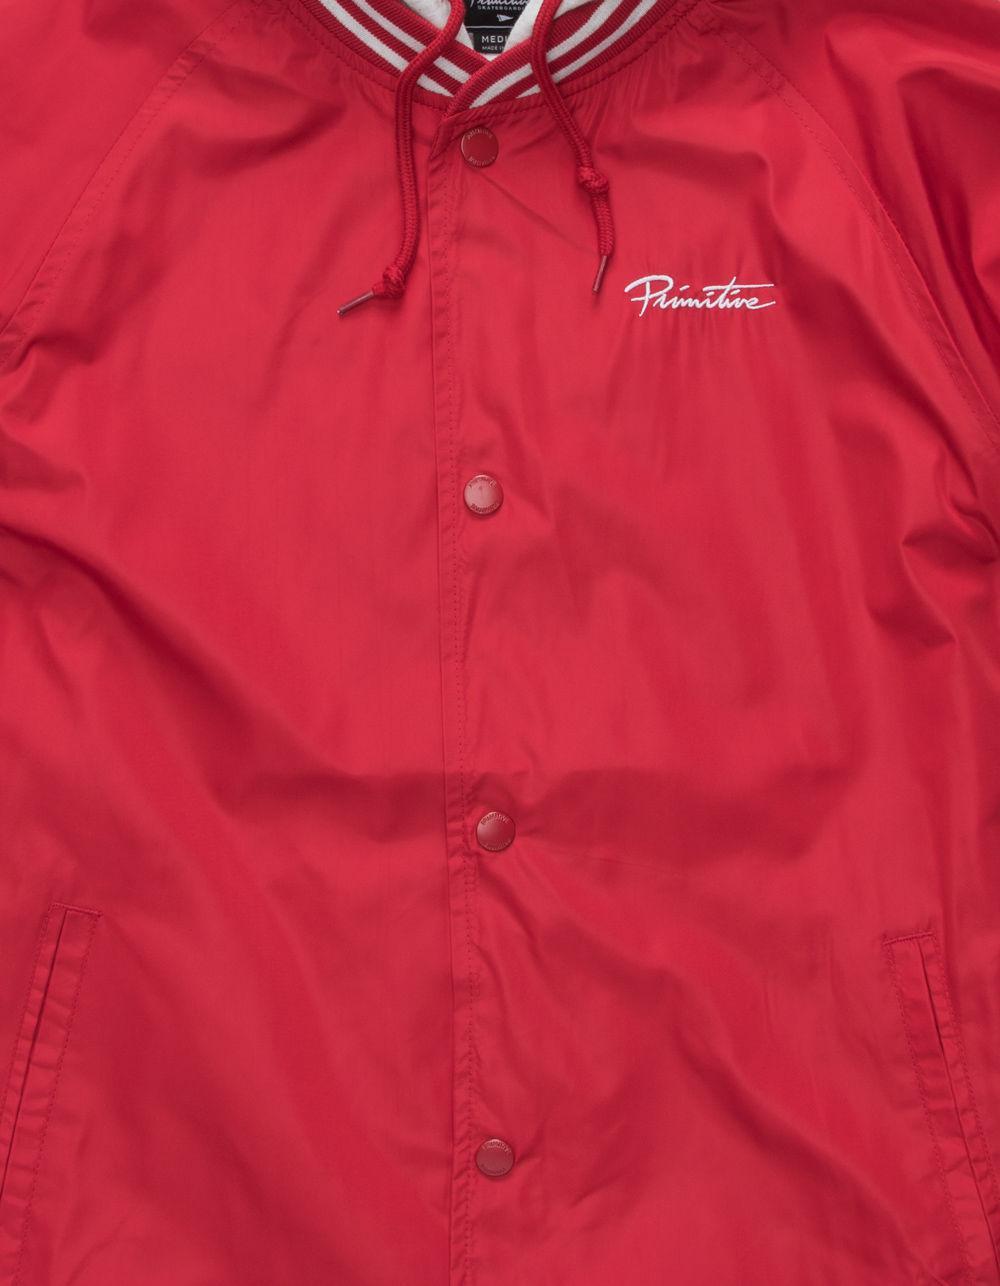 17eecdbcd Primitive 2-fer Mens Hooded Jacket in Red for Men - Lyst